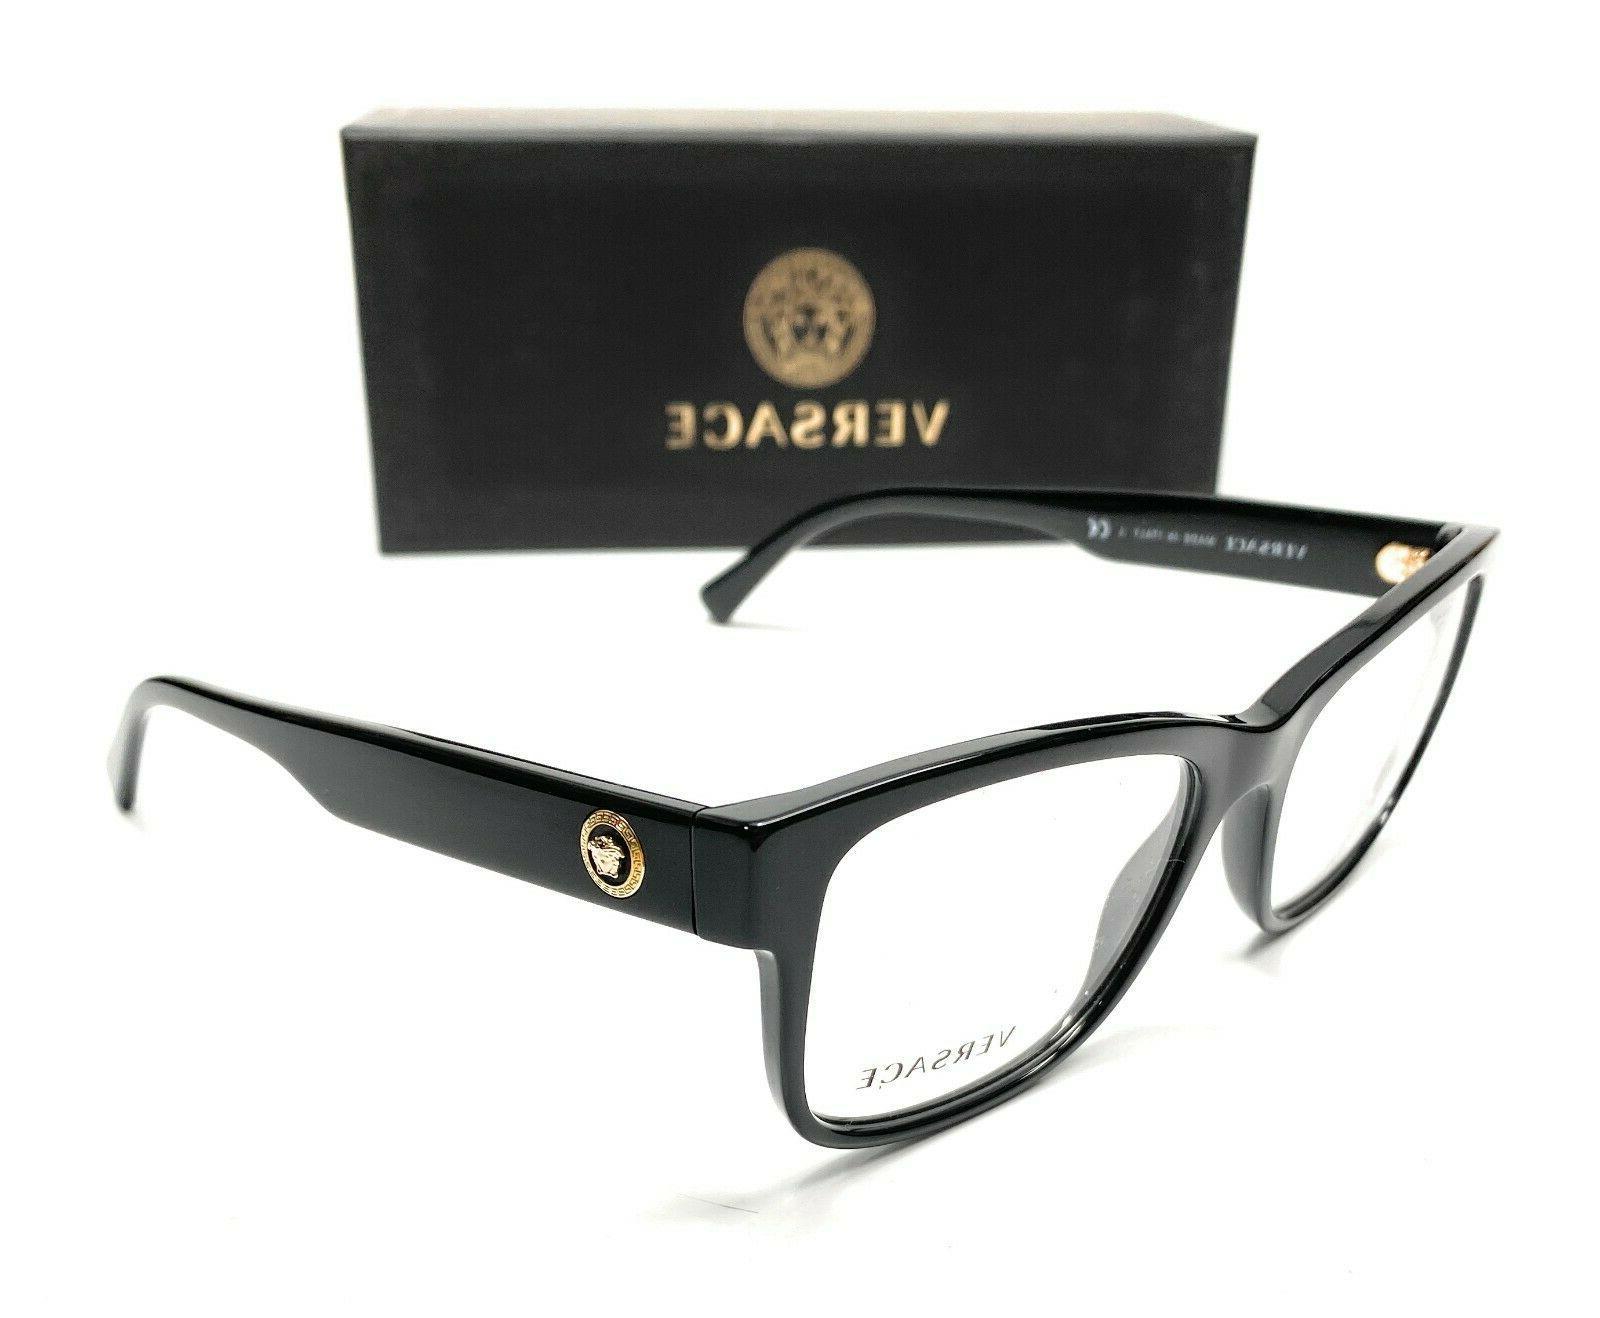 brand new eyeglass frames 3266 gb1 black